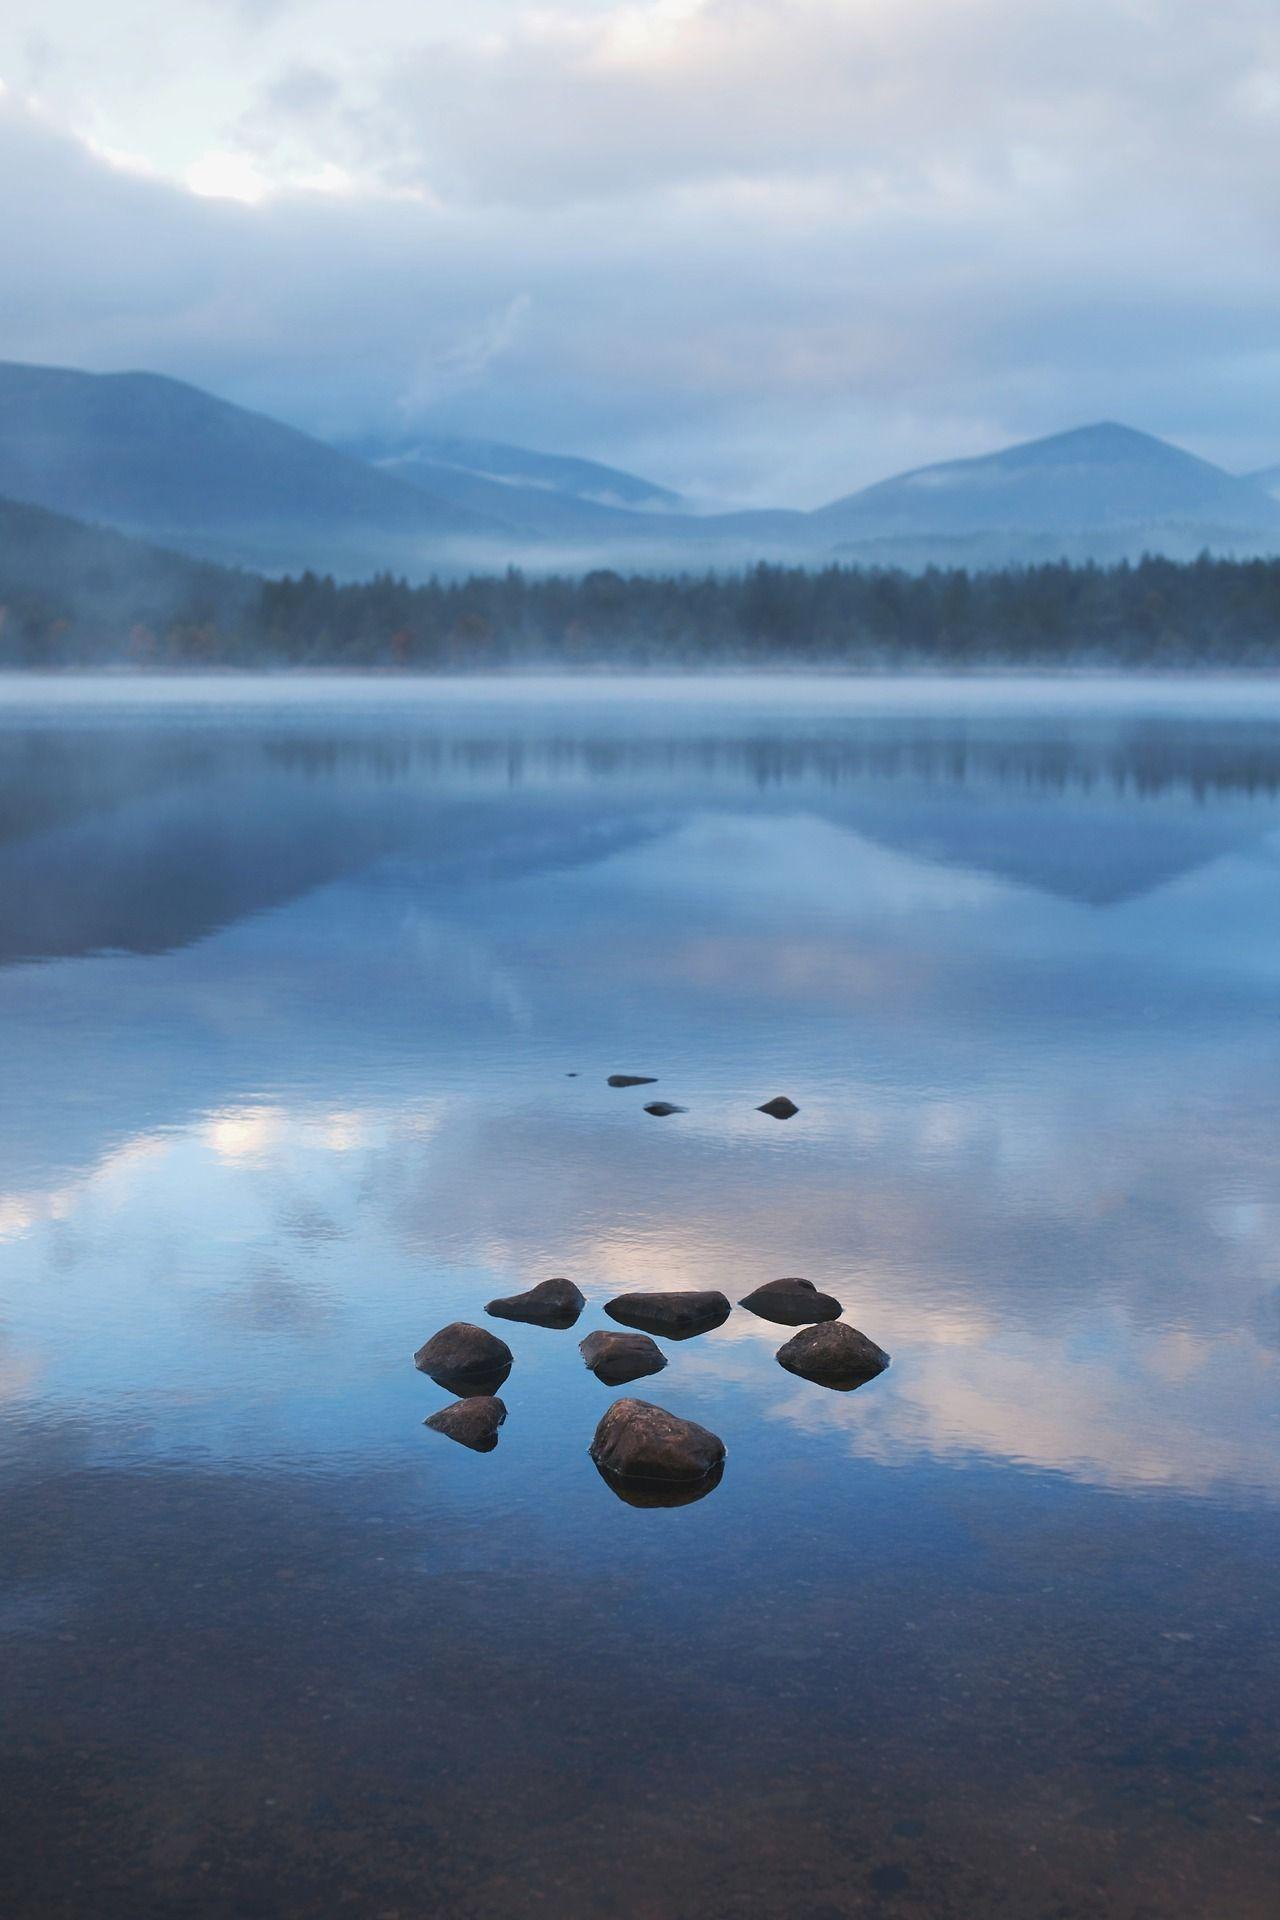 Loch Morlich By Kyle Bonallo Loch Scotland Lake Reflection Nature Landscape Scenic Pictures Scenery Pictures Scotland Nature